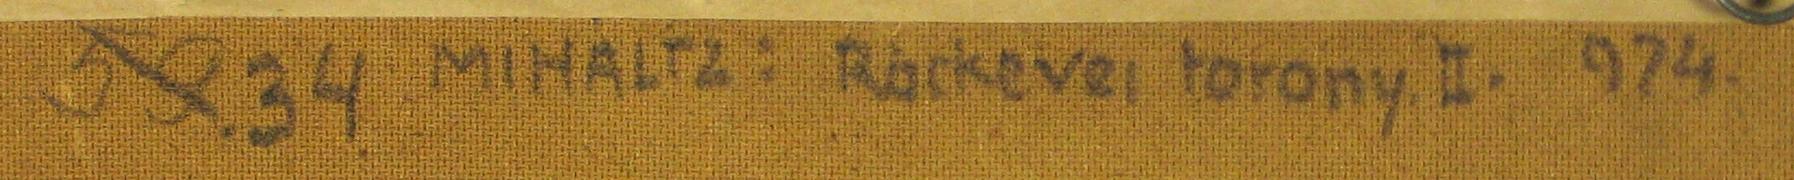 10-4c.jpg (1794�180)